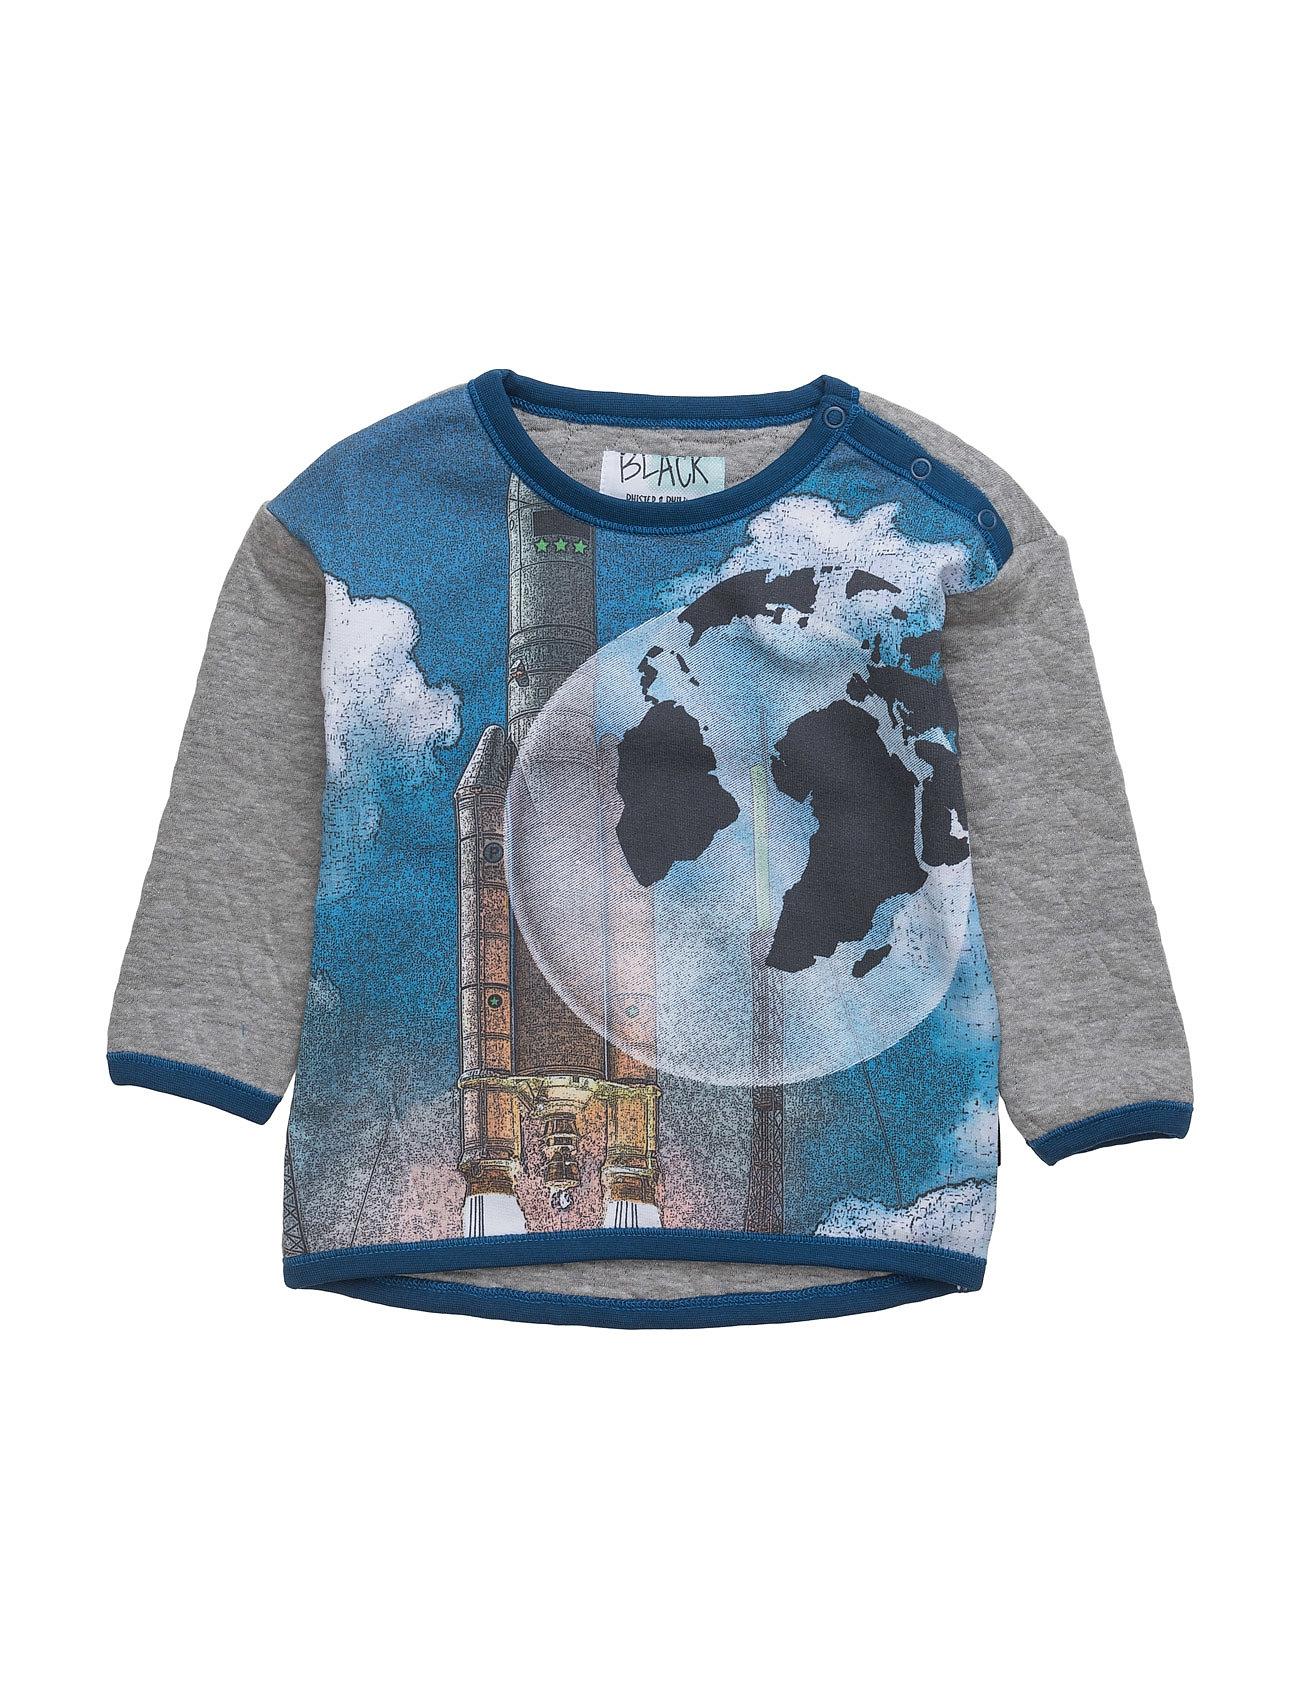 635c148ca60 Superkule Kenneth Quilty Sweat Phister & Philina Mede T-Skjorter til til  hverdags og fest